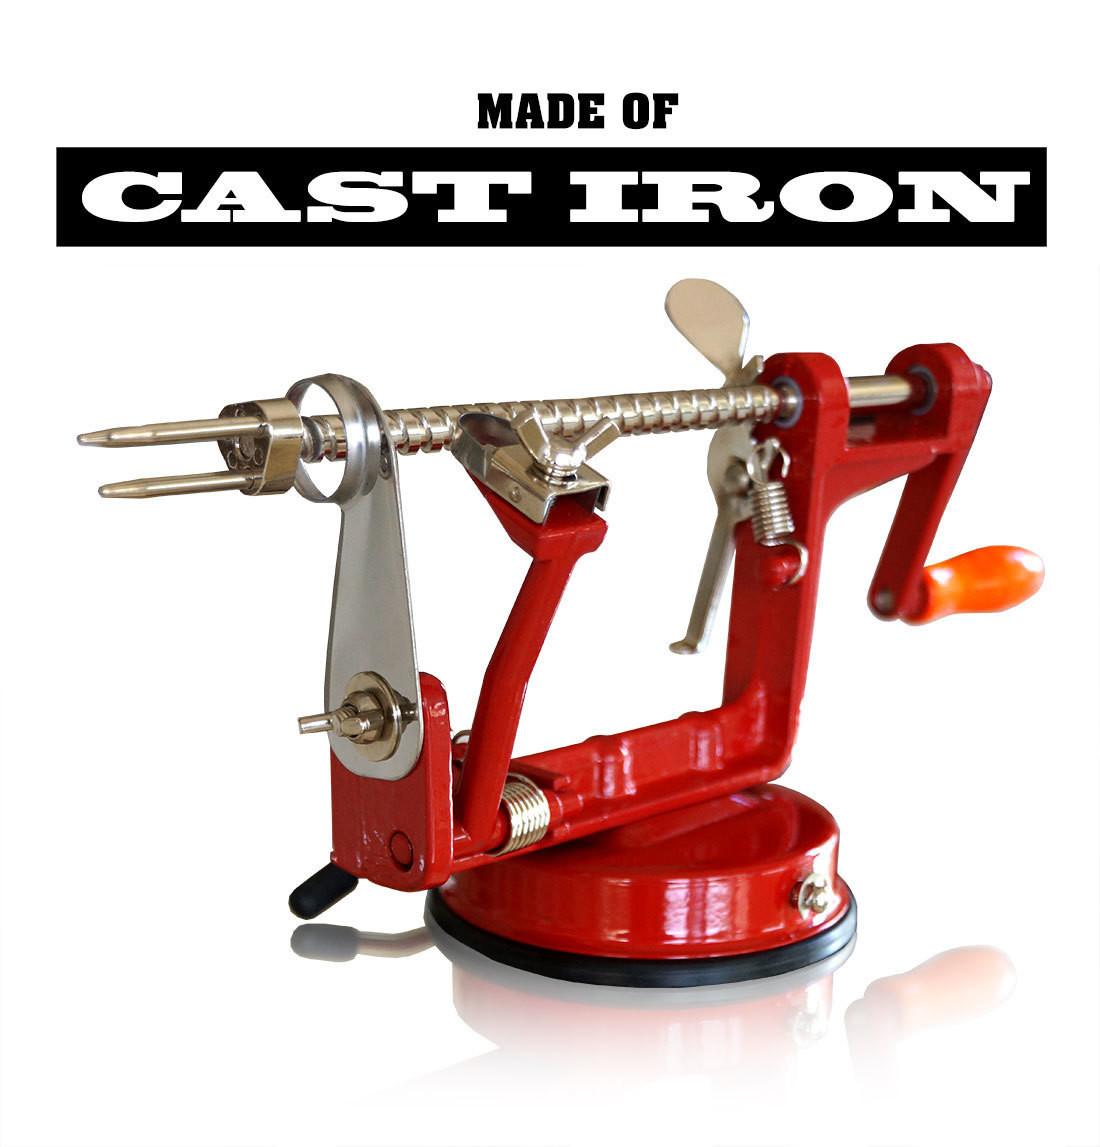 Cast Iron Apple Peeler